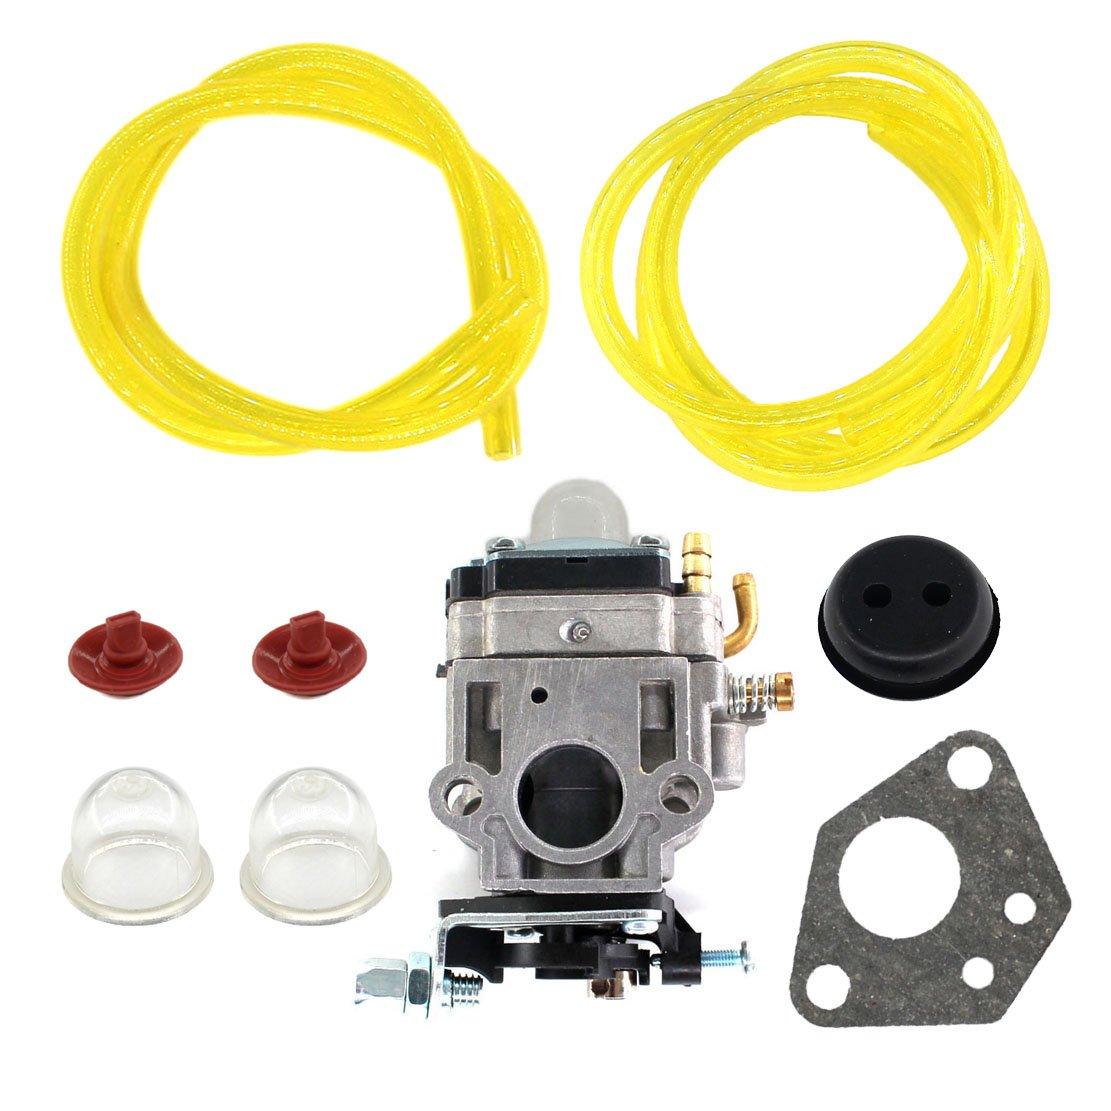 USPEEDA Carburetor & Gasket for Shindaiwa EB8510 EB8510RT Blower Carb A021002060 Grommet Check Valve Fuel Line